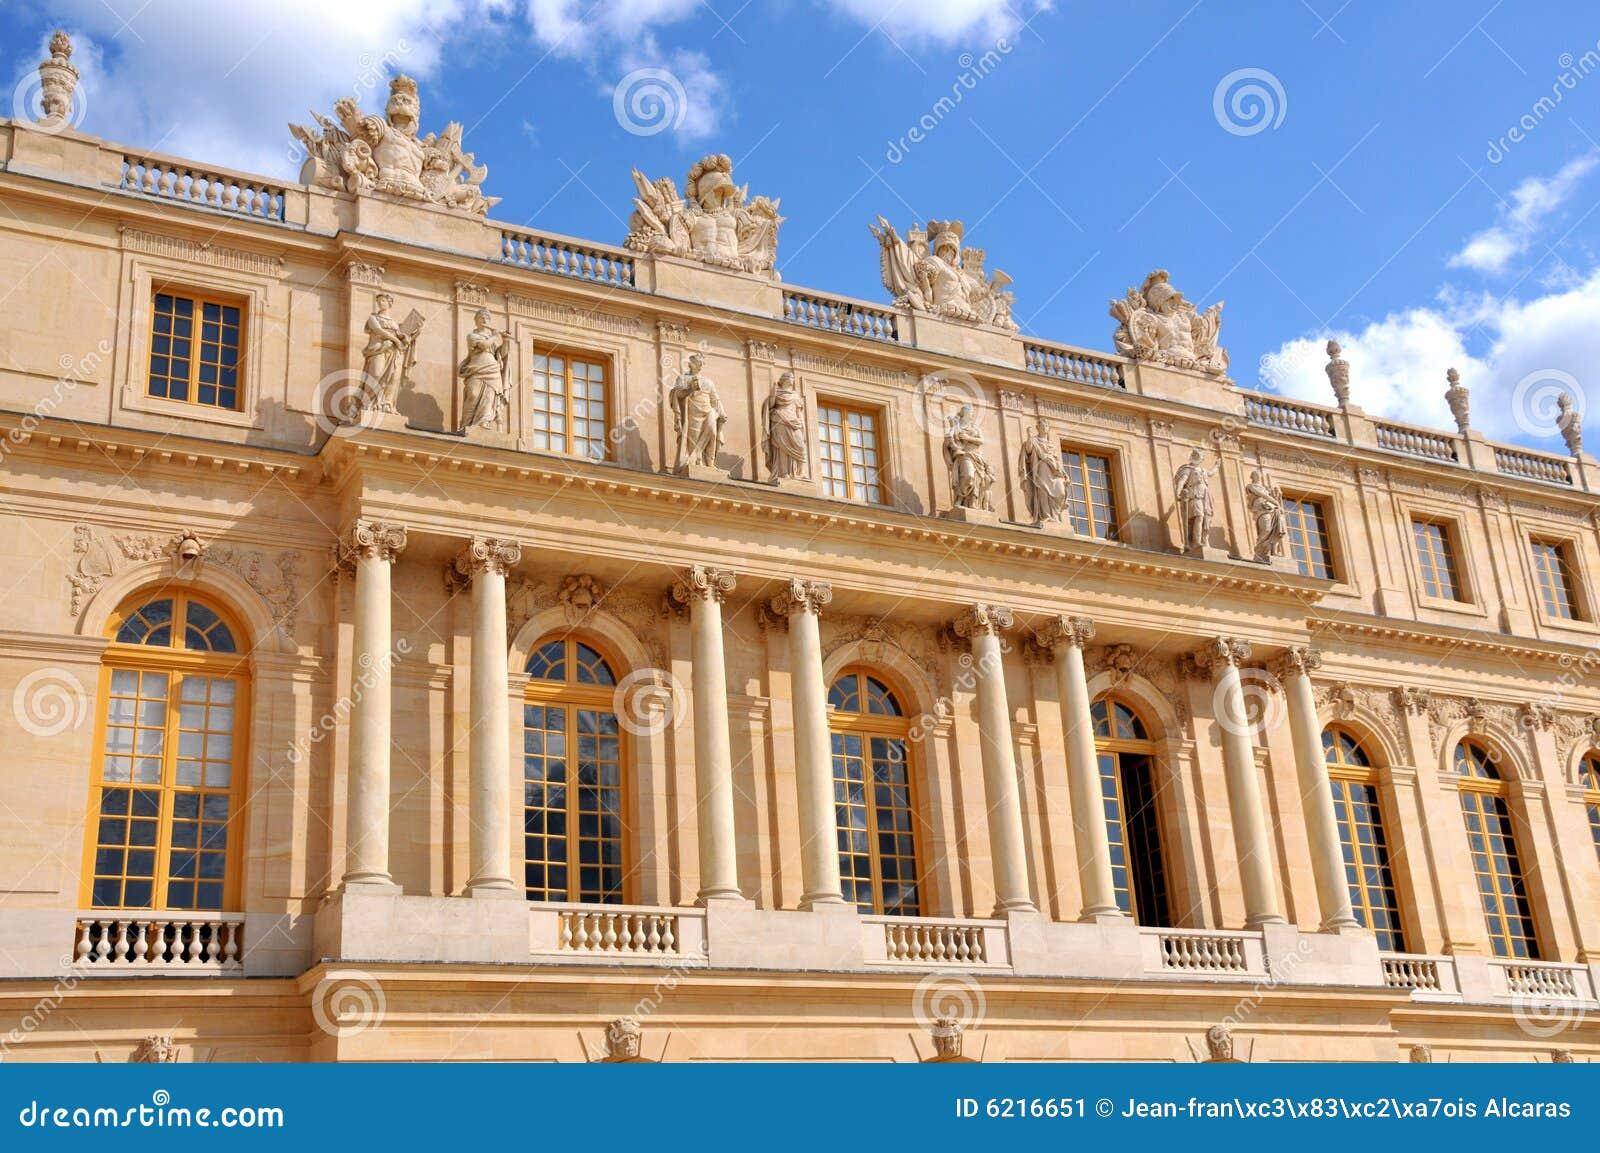 Castello di Versailles - 02